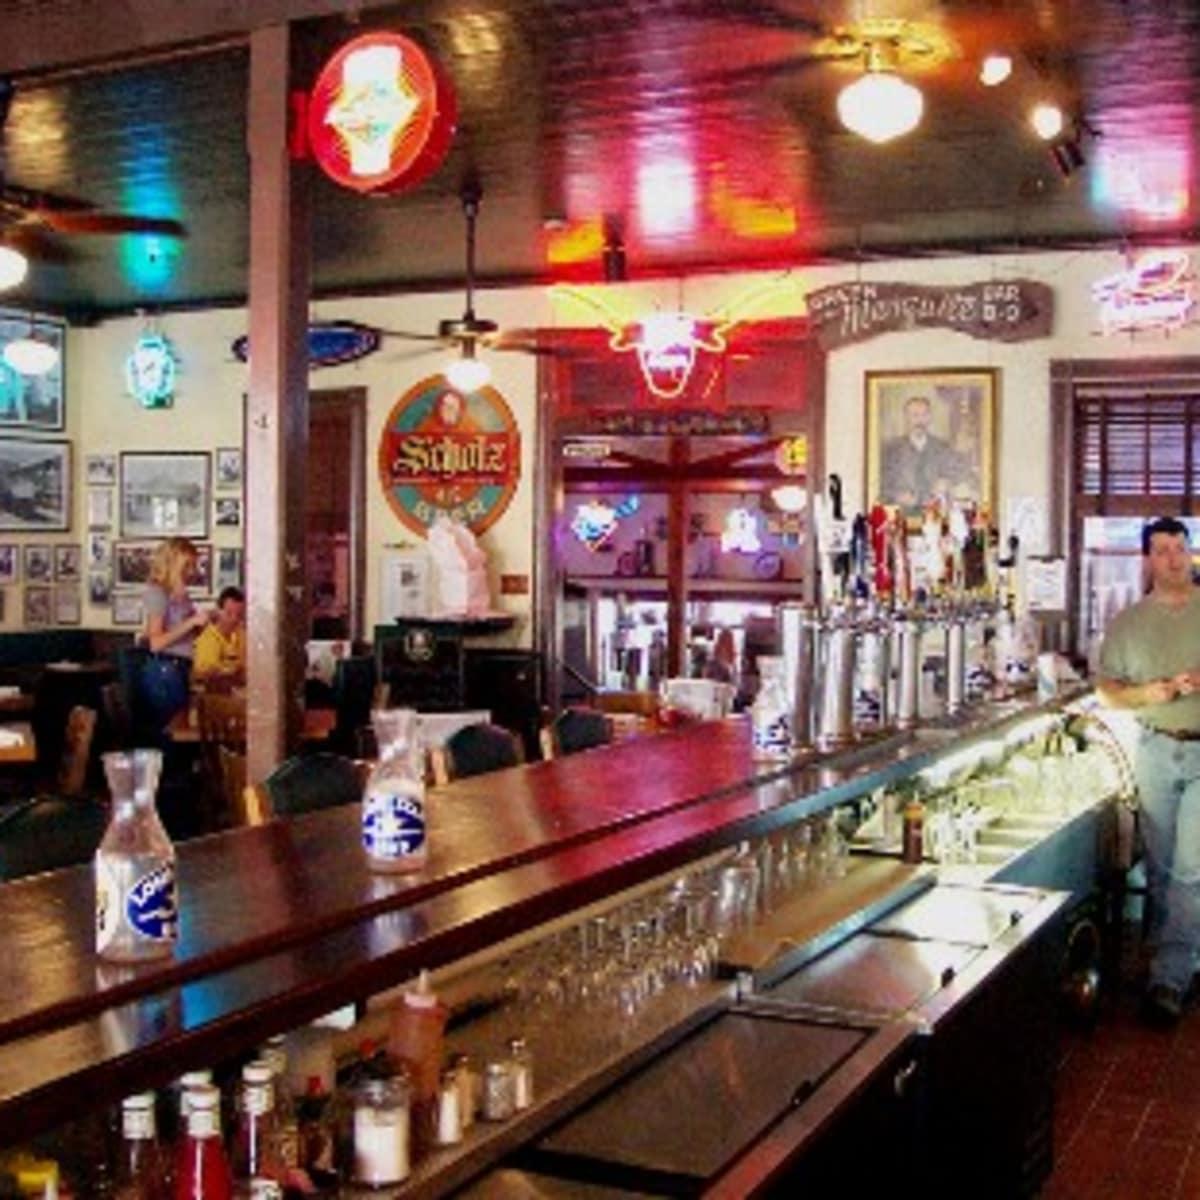 Austin Photo: places_food_scholz garten_interior